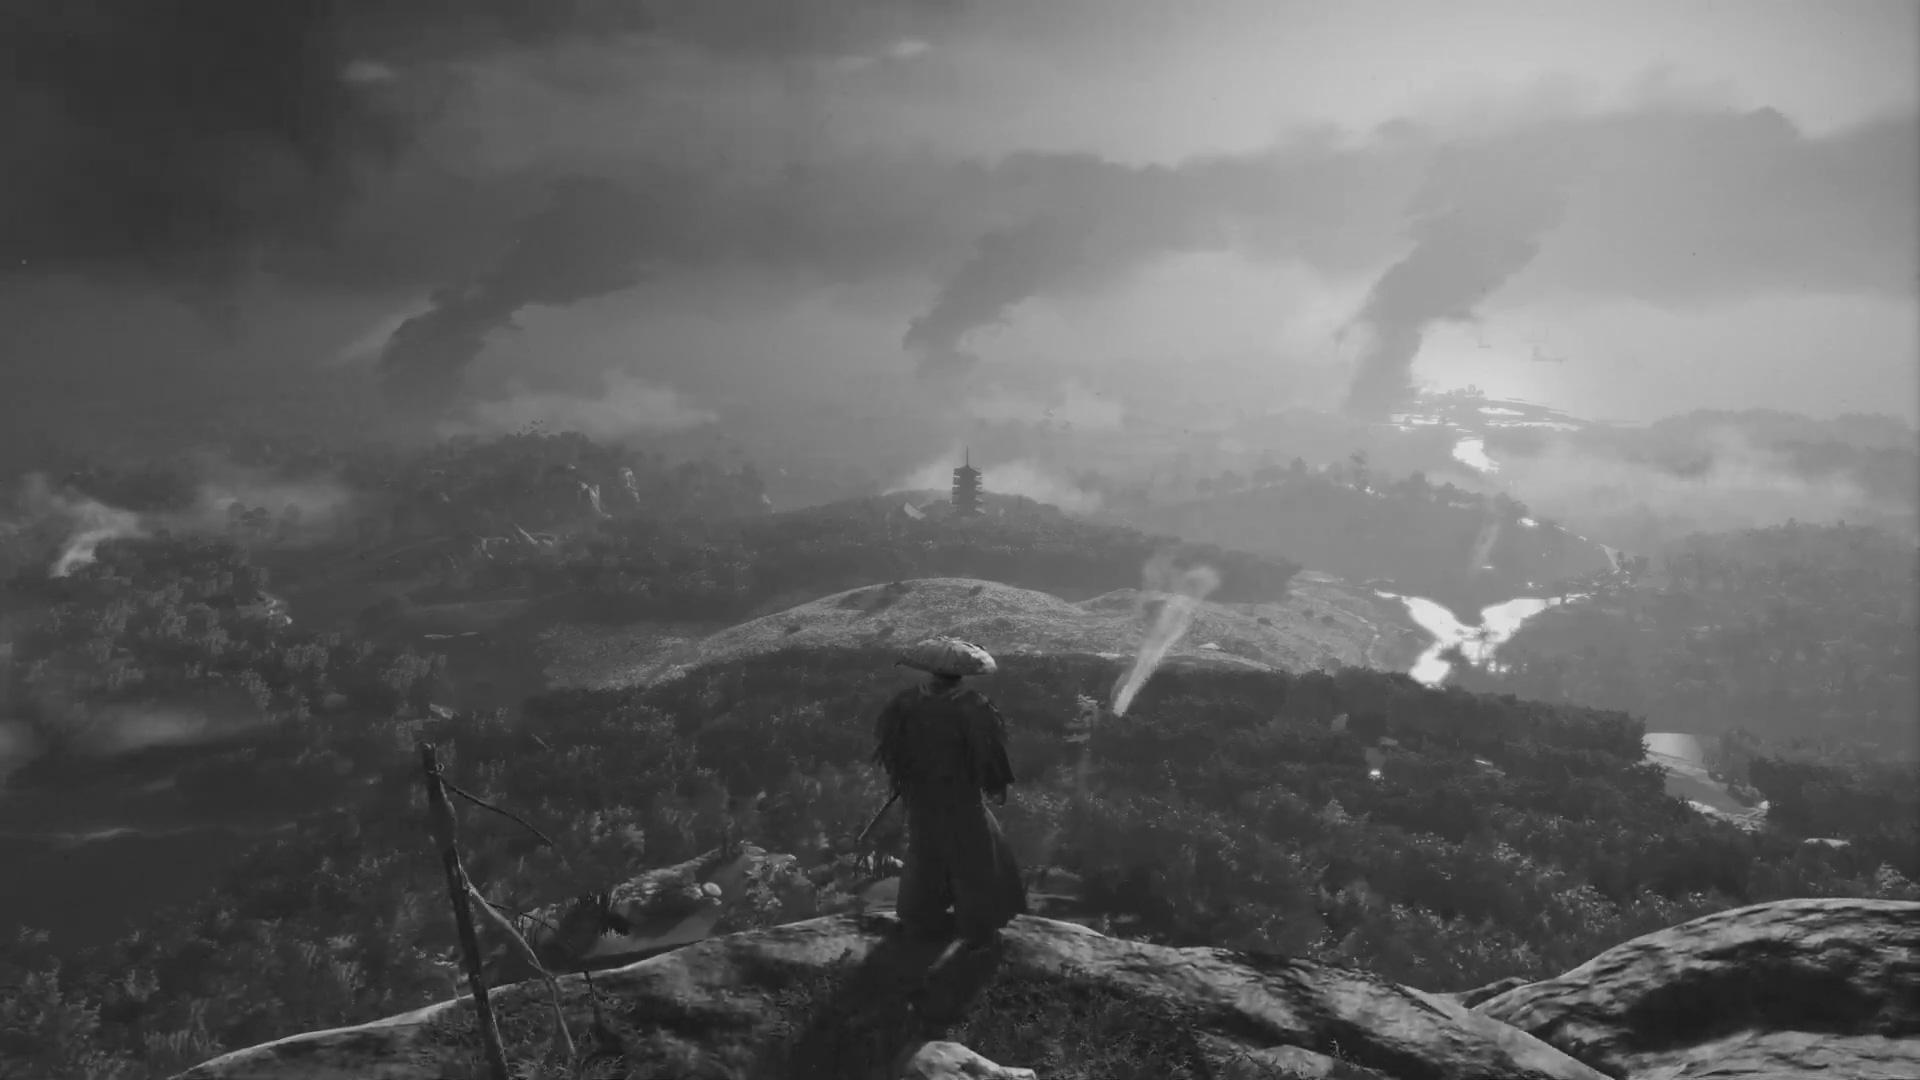 Ghost of Tsushima has a cinema-inspired black and white mode screenshot